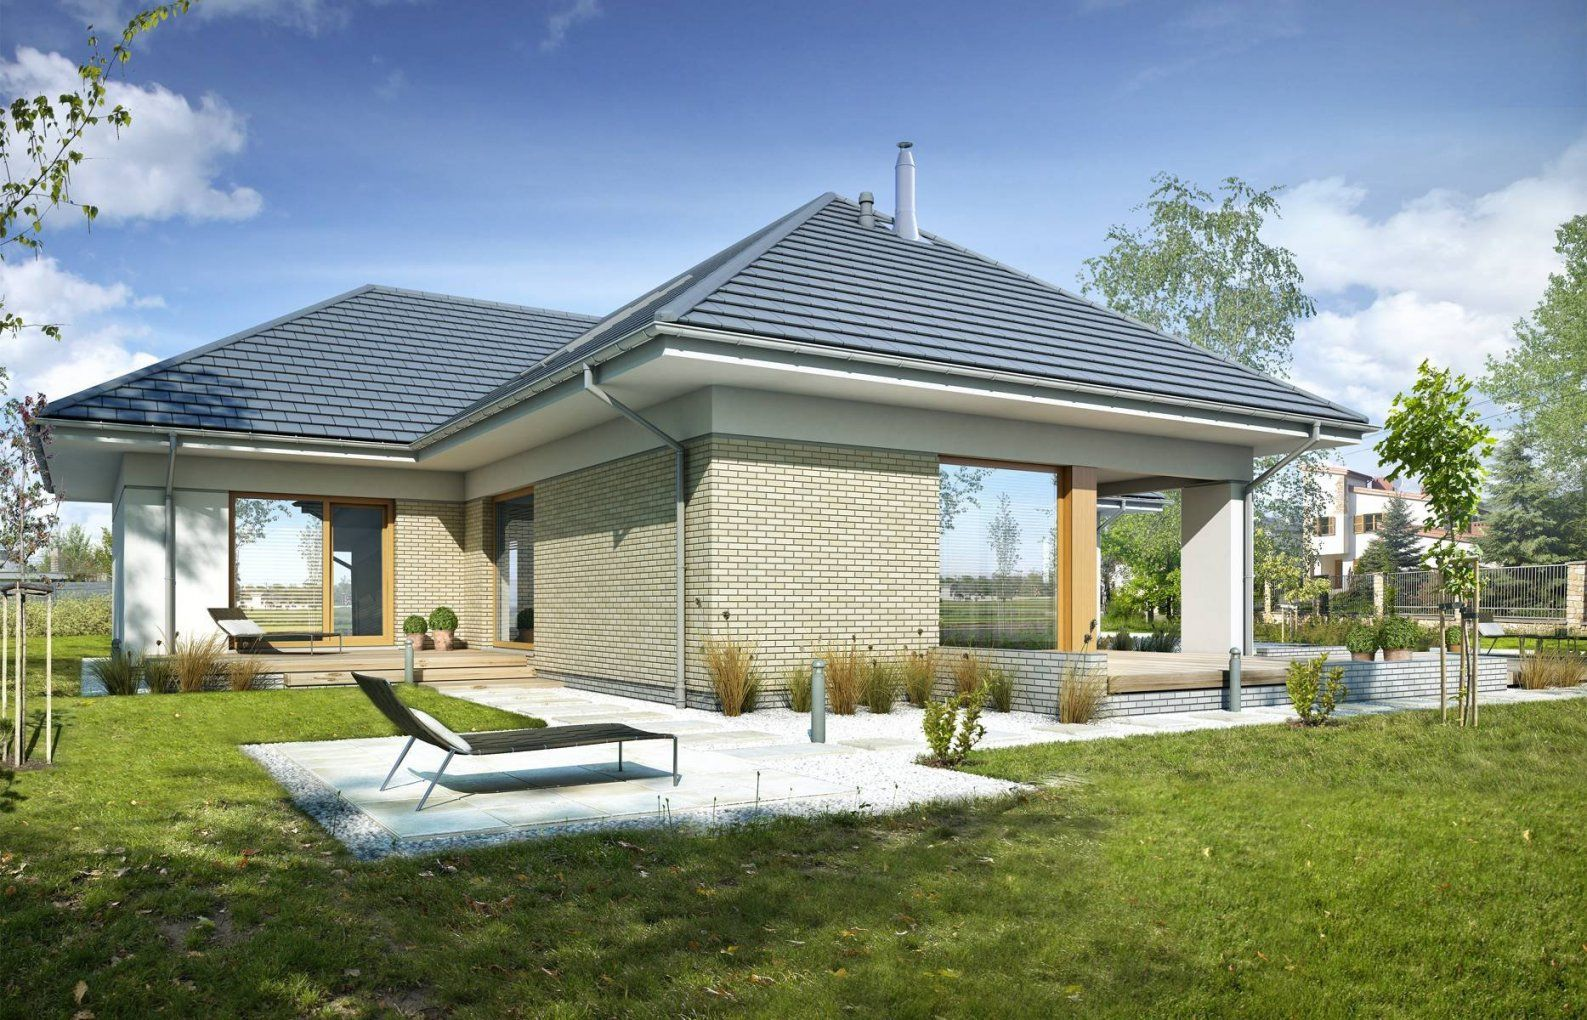 Fertighaus Heban Aus Polen  Bungalow Dachgeschoss von Schlüsselfertige Häuser Aus Polen Photo